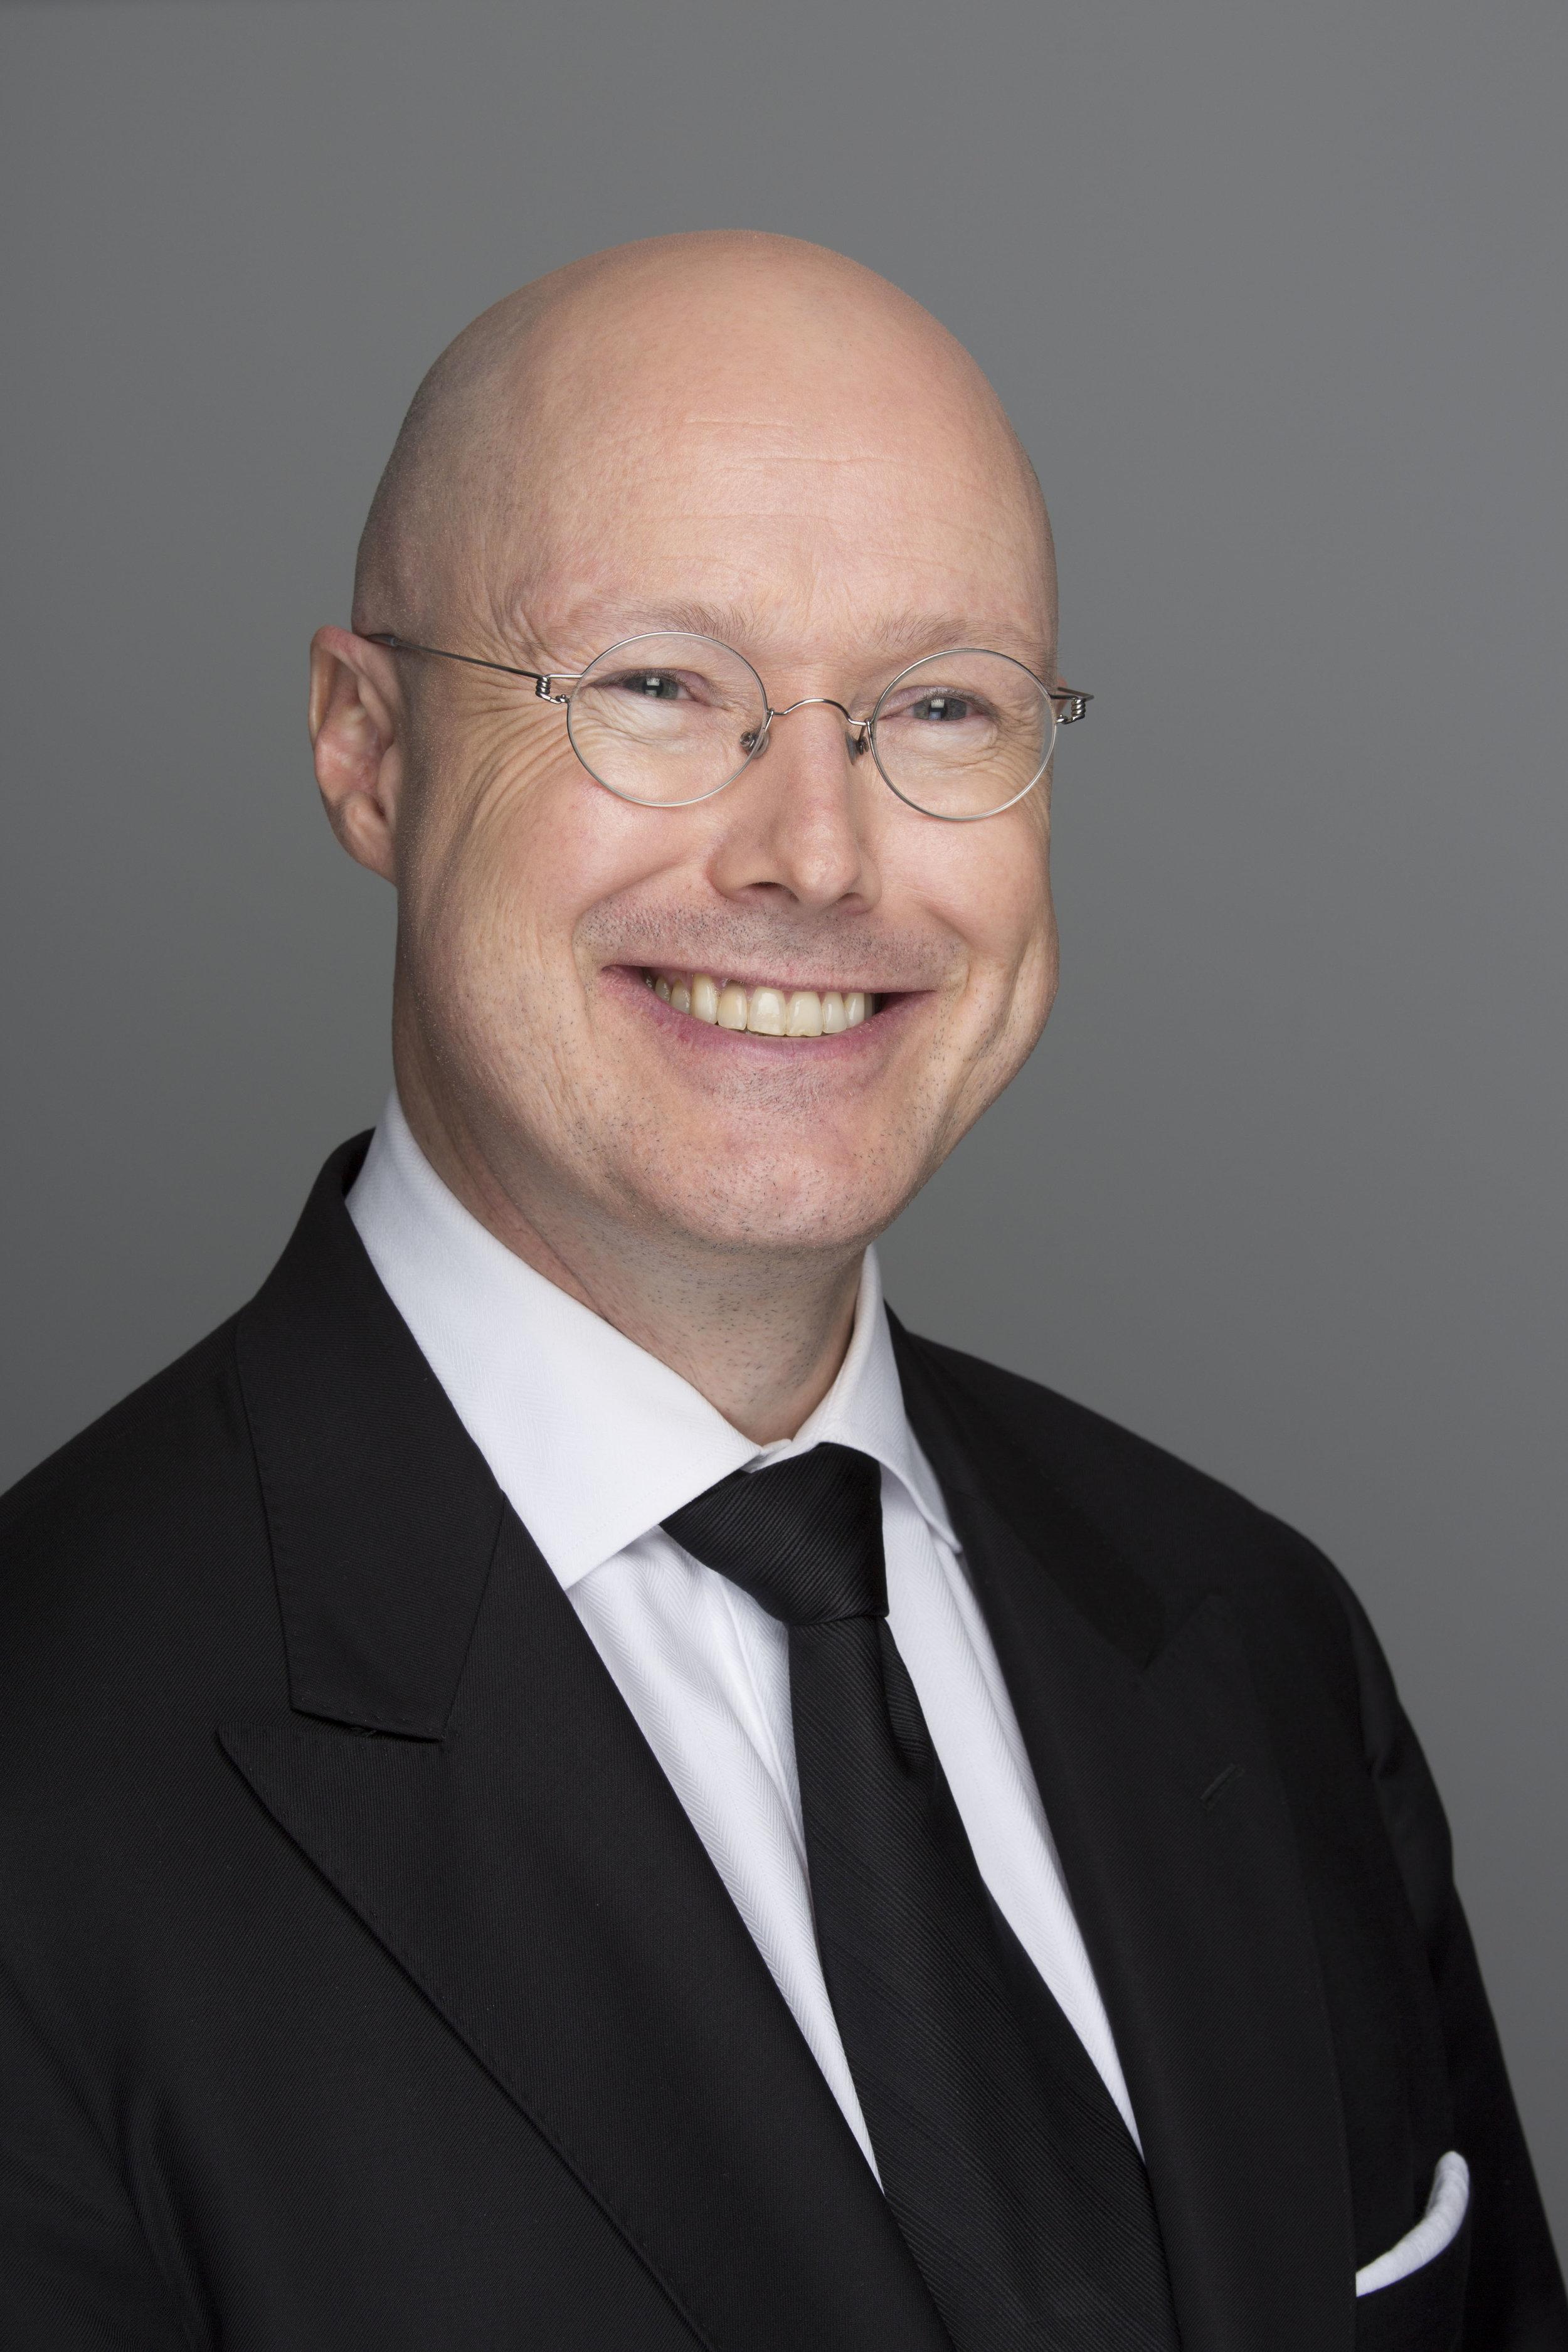 Andrew noolan - PartnerE ajn@bwslawyers.com.auP 02 9394 1087